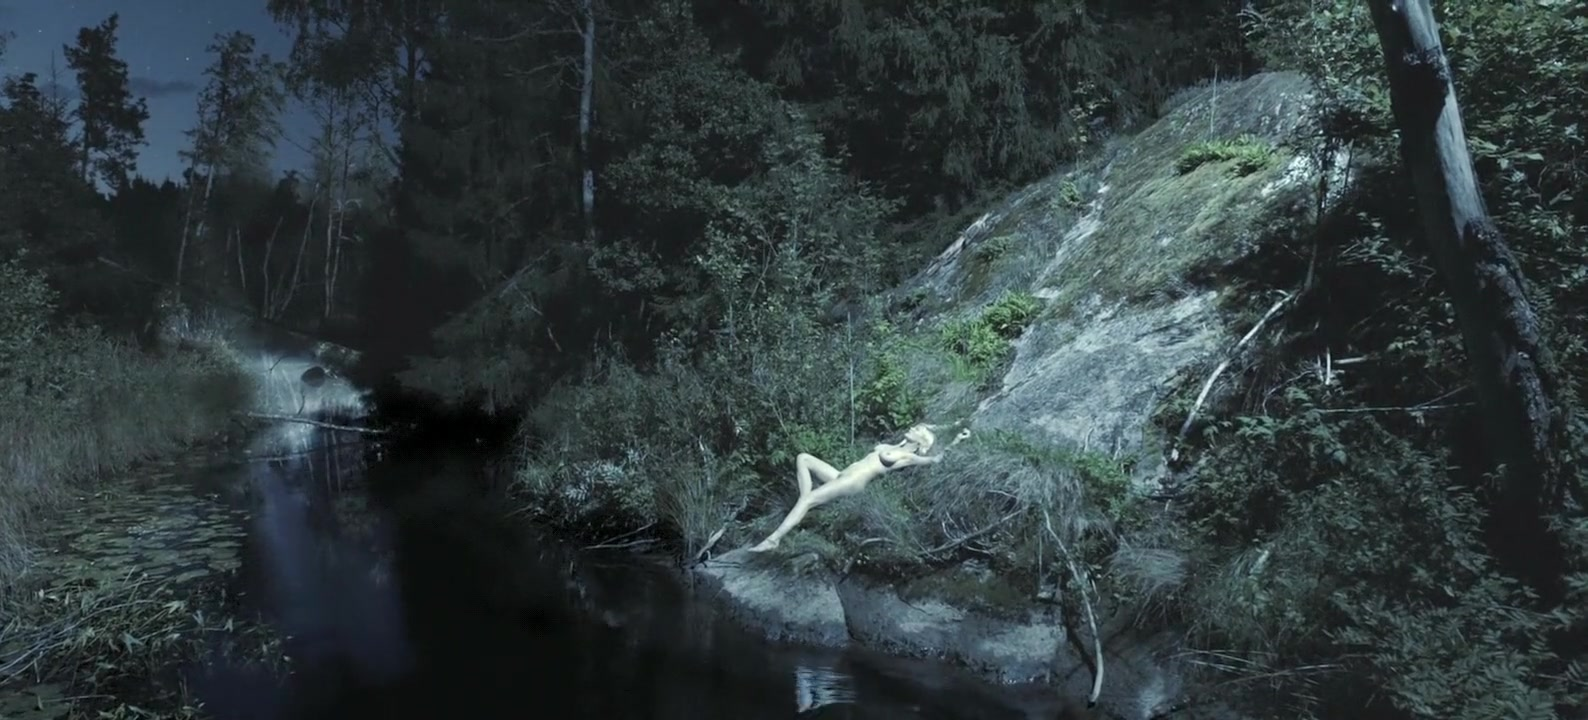 Nude photos Free Hookup Websites Like Plenty Of Fish